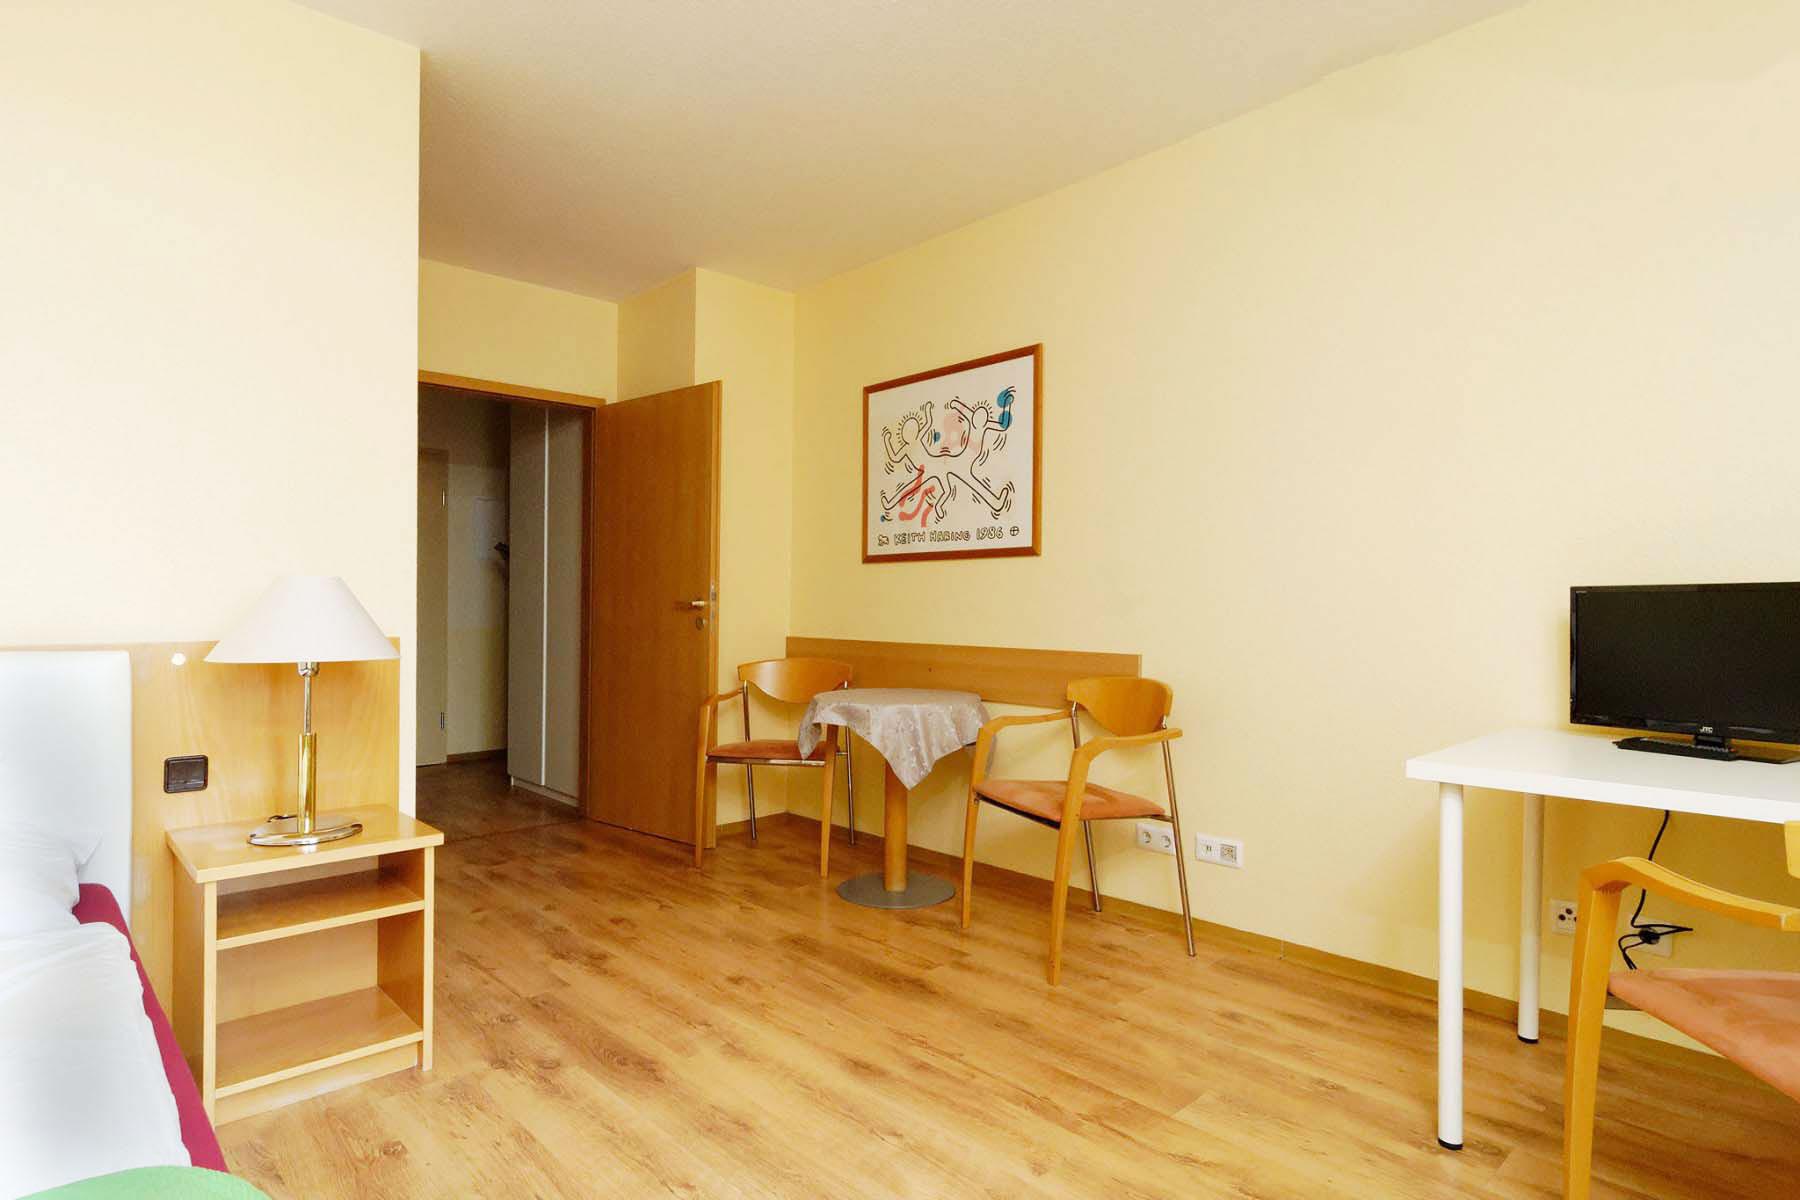 ap 5 1 zimmer apartment berlin 25 50 m. Black Bedroom Furniture Sets. Home Design Ideas